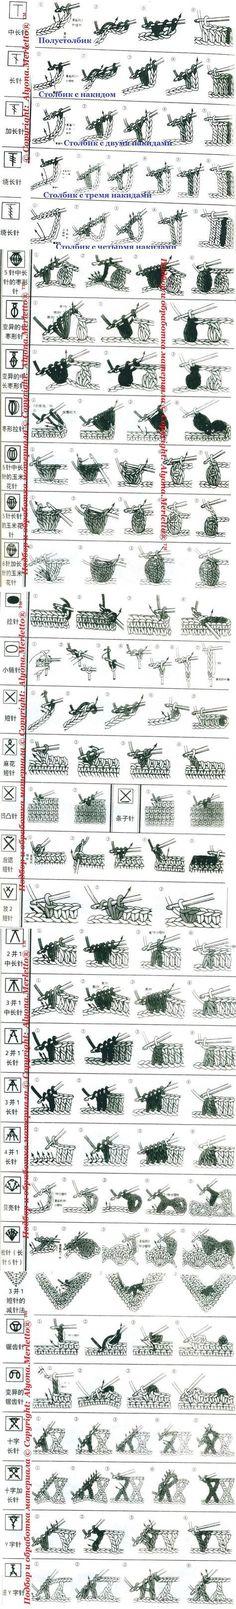 http://www.thepurpleponcho.com/diy-crochet-tutorial-how-to-make-chain-loop-edging/